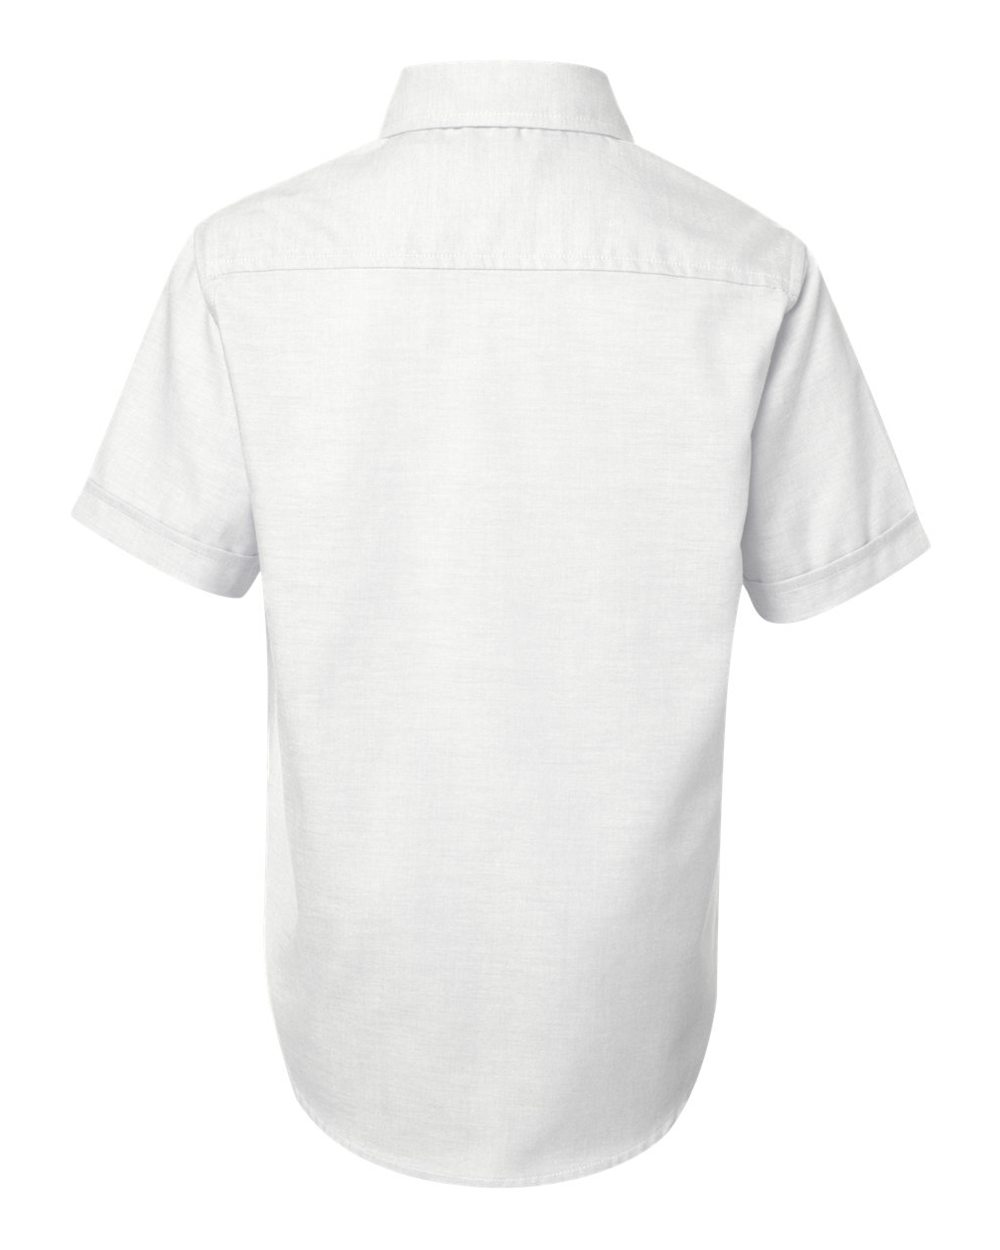 French Toast French Toast E9003 Boys Short Sleeve Oxford Shirt